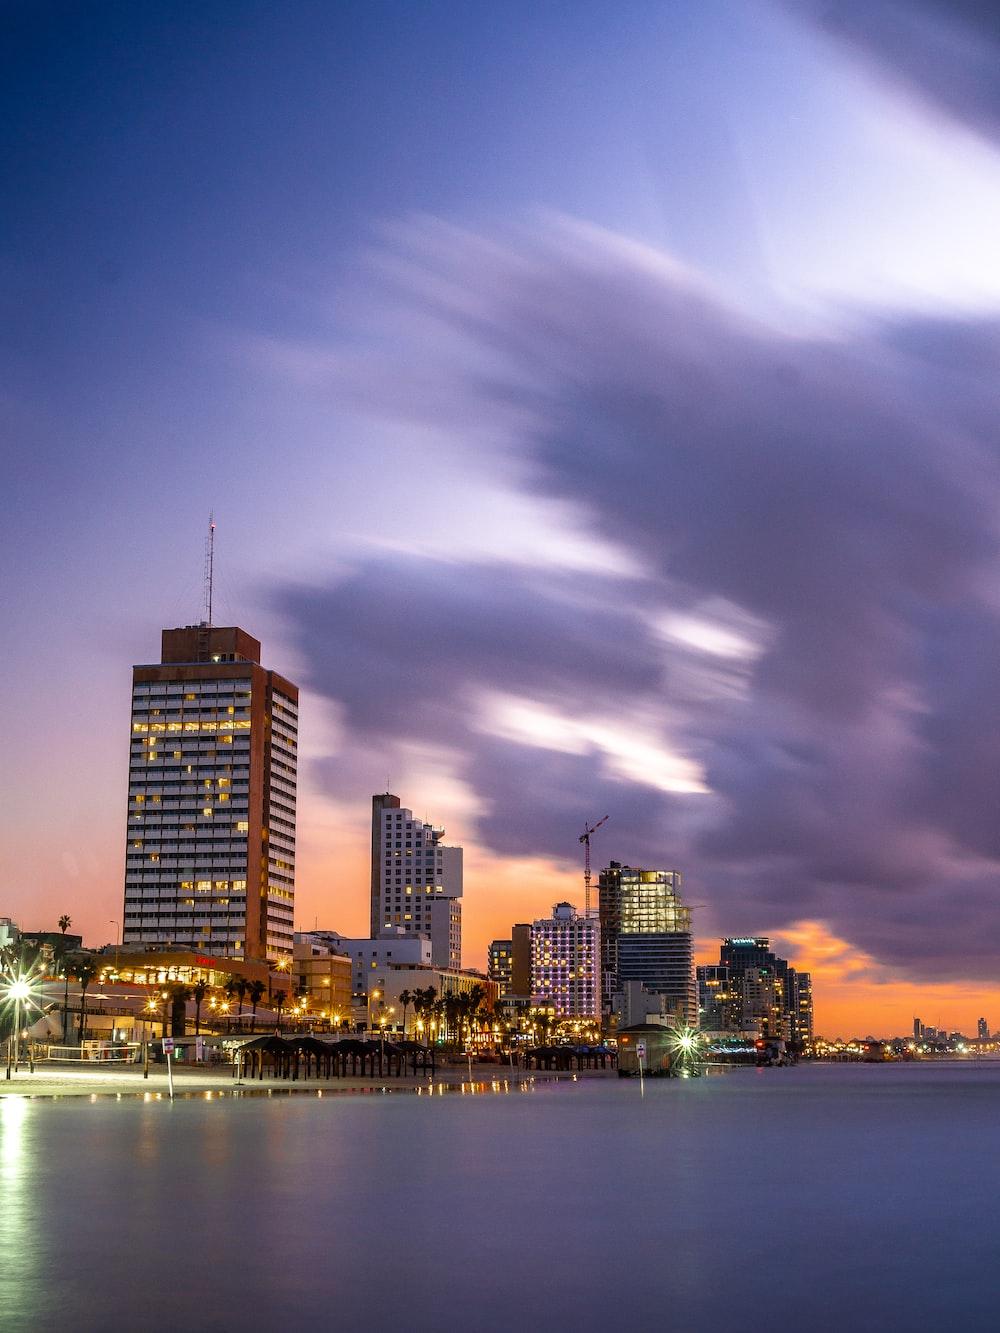 landscape cityscape photography during golden hour